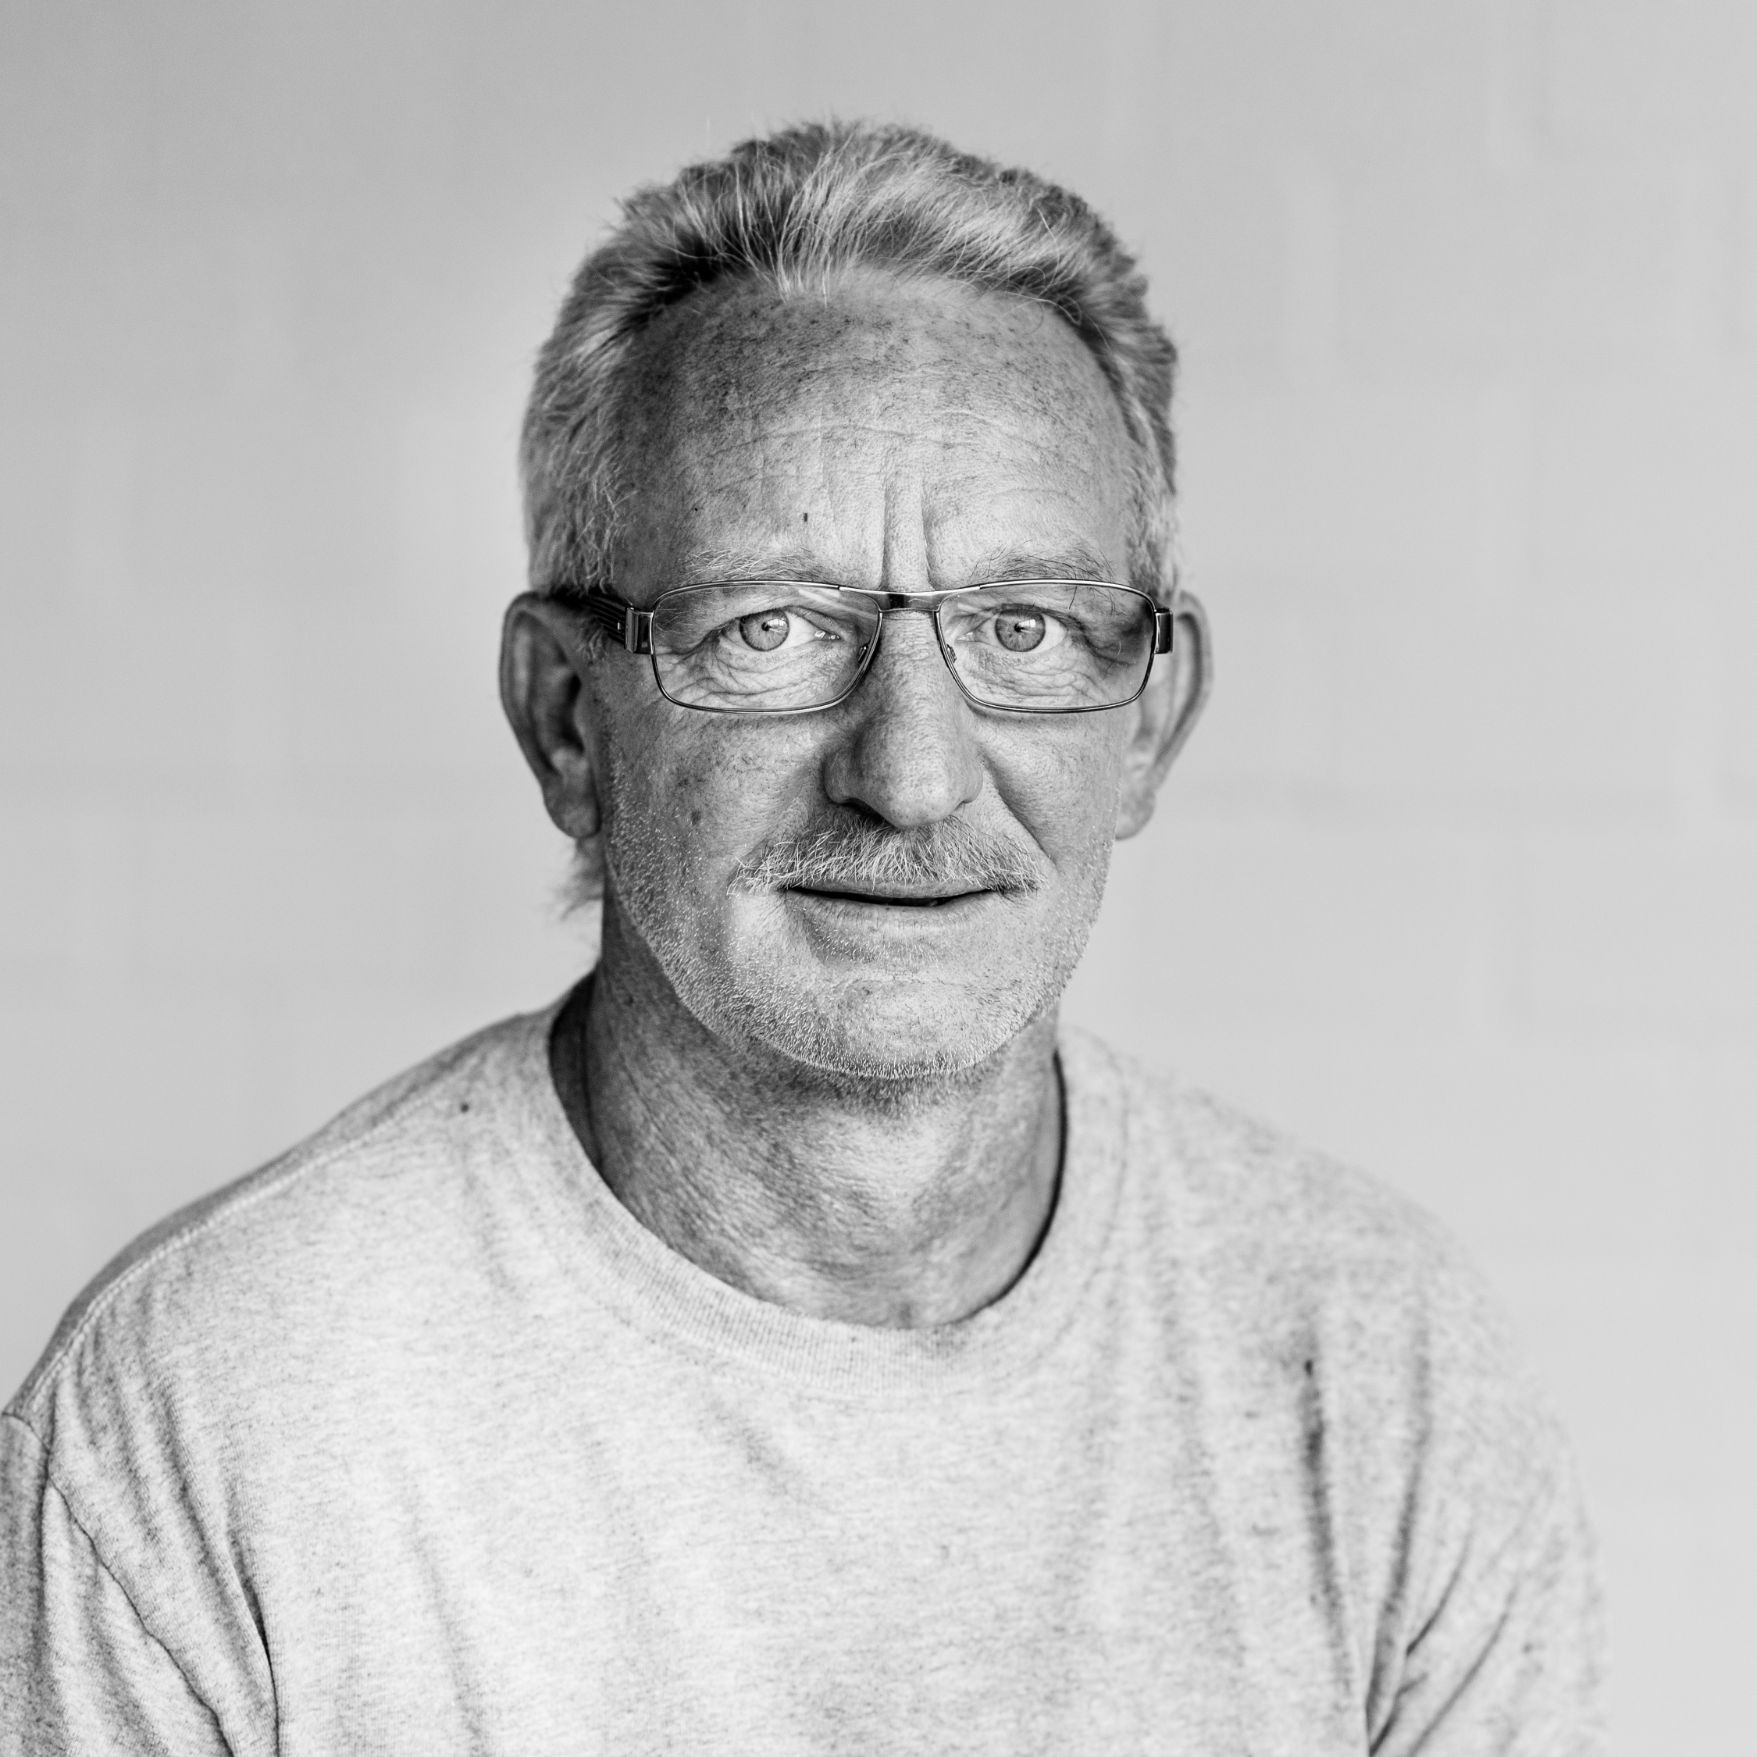 Steve Lembrechts